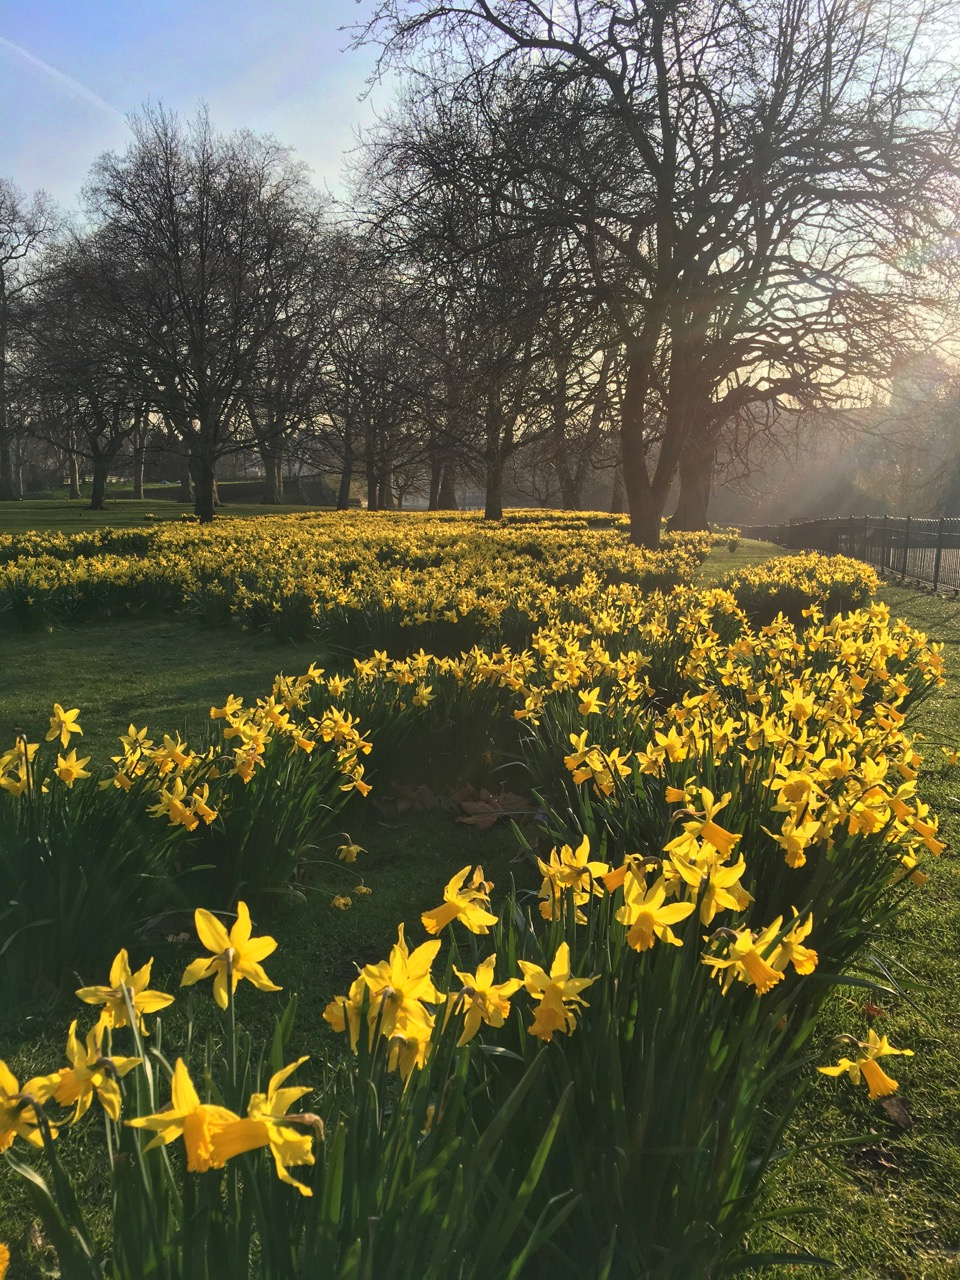 Daffodils, St James Park, London